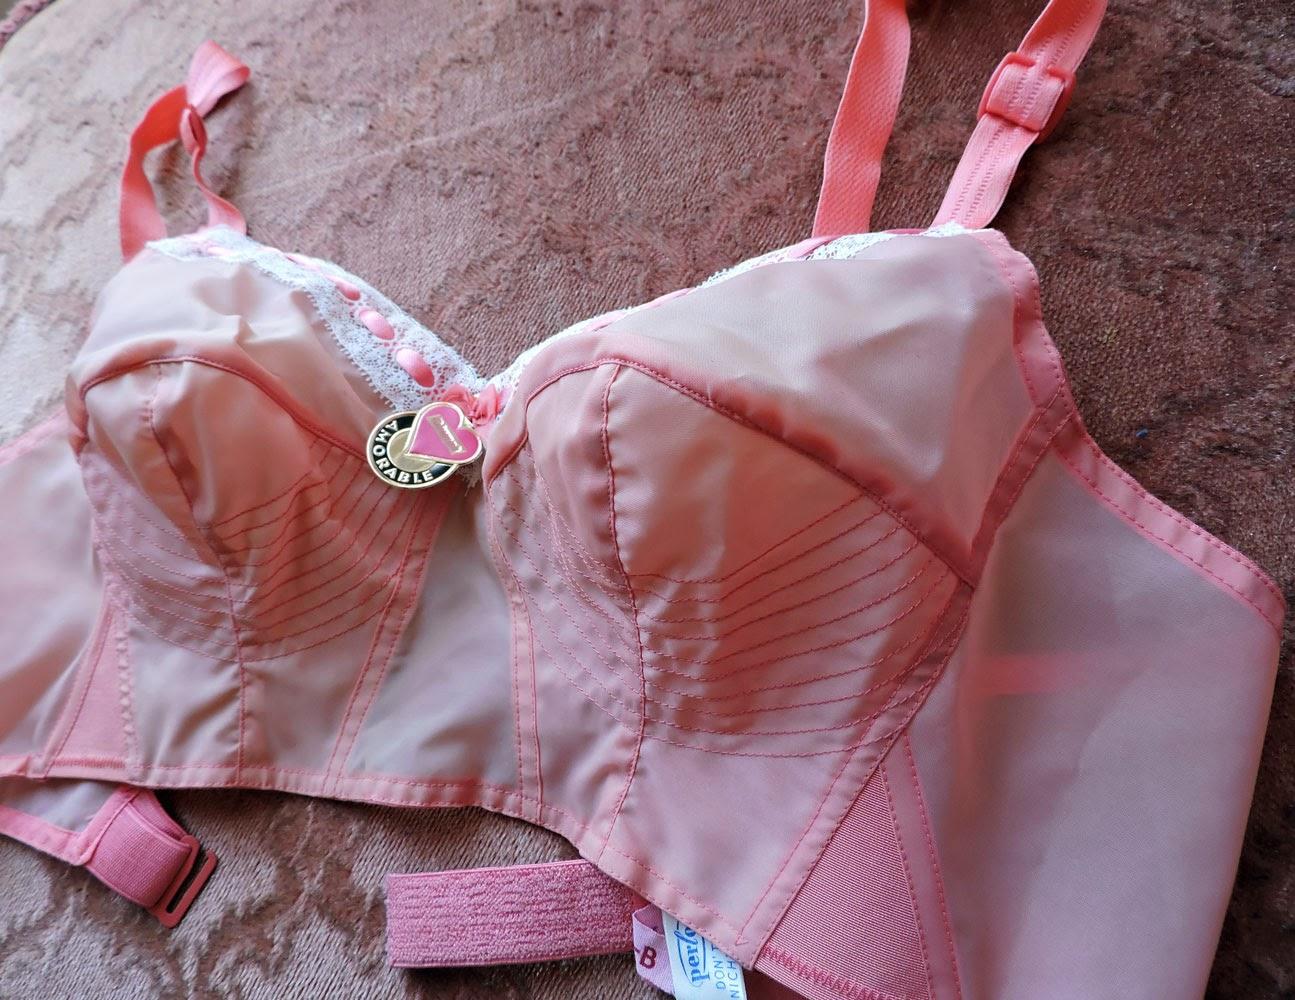 http://www.ebay.de/itm/Bullet-Bra-50er-Rosa-Peach-Bustenhalter-Vintage-Spitztute-BH-Triumph-Deadstock-/161612715217?pt=DE_Vintage_Damenunterw%C3%A4sche&hash=item25a0de54d1